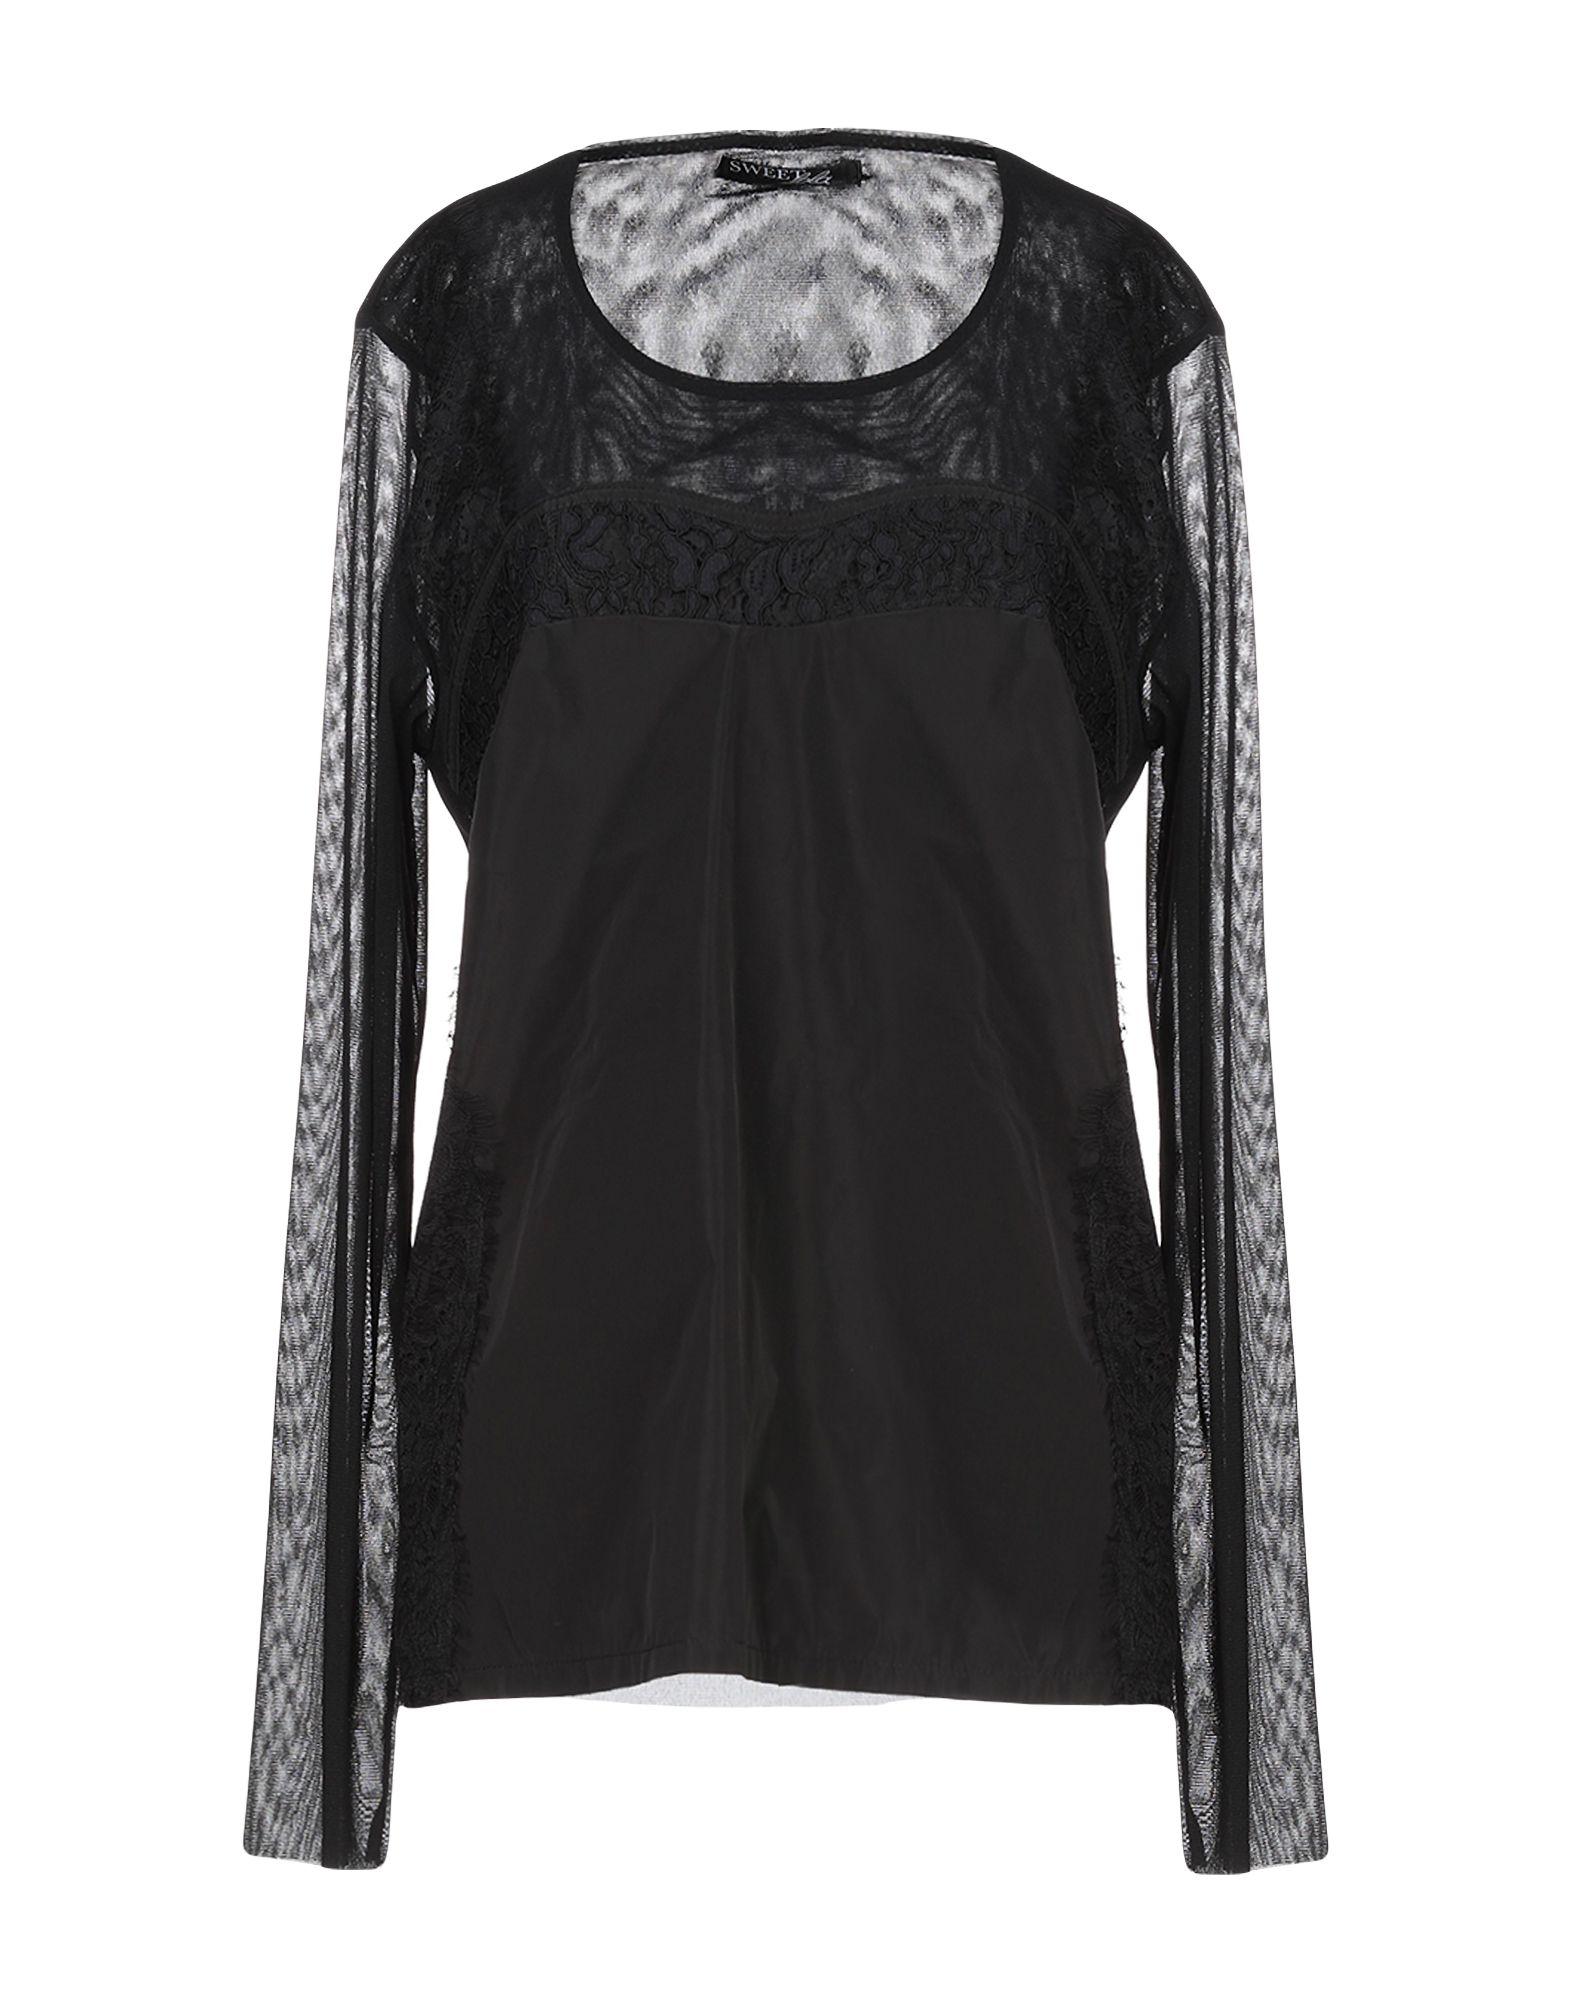 цены на SWEET LOLA Блузка  в интернет-магазинах